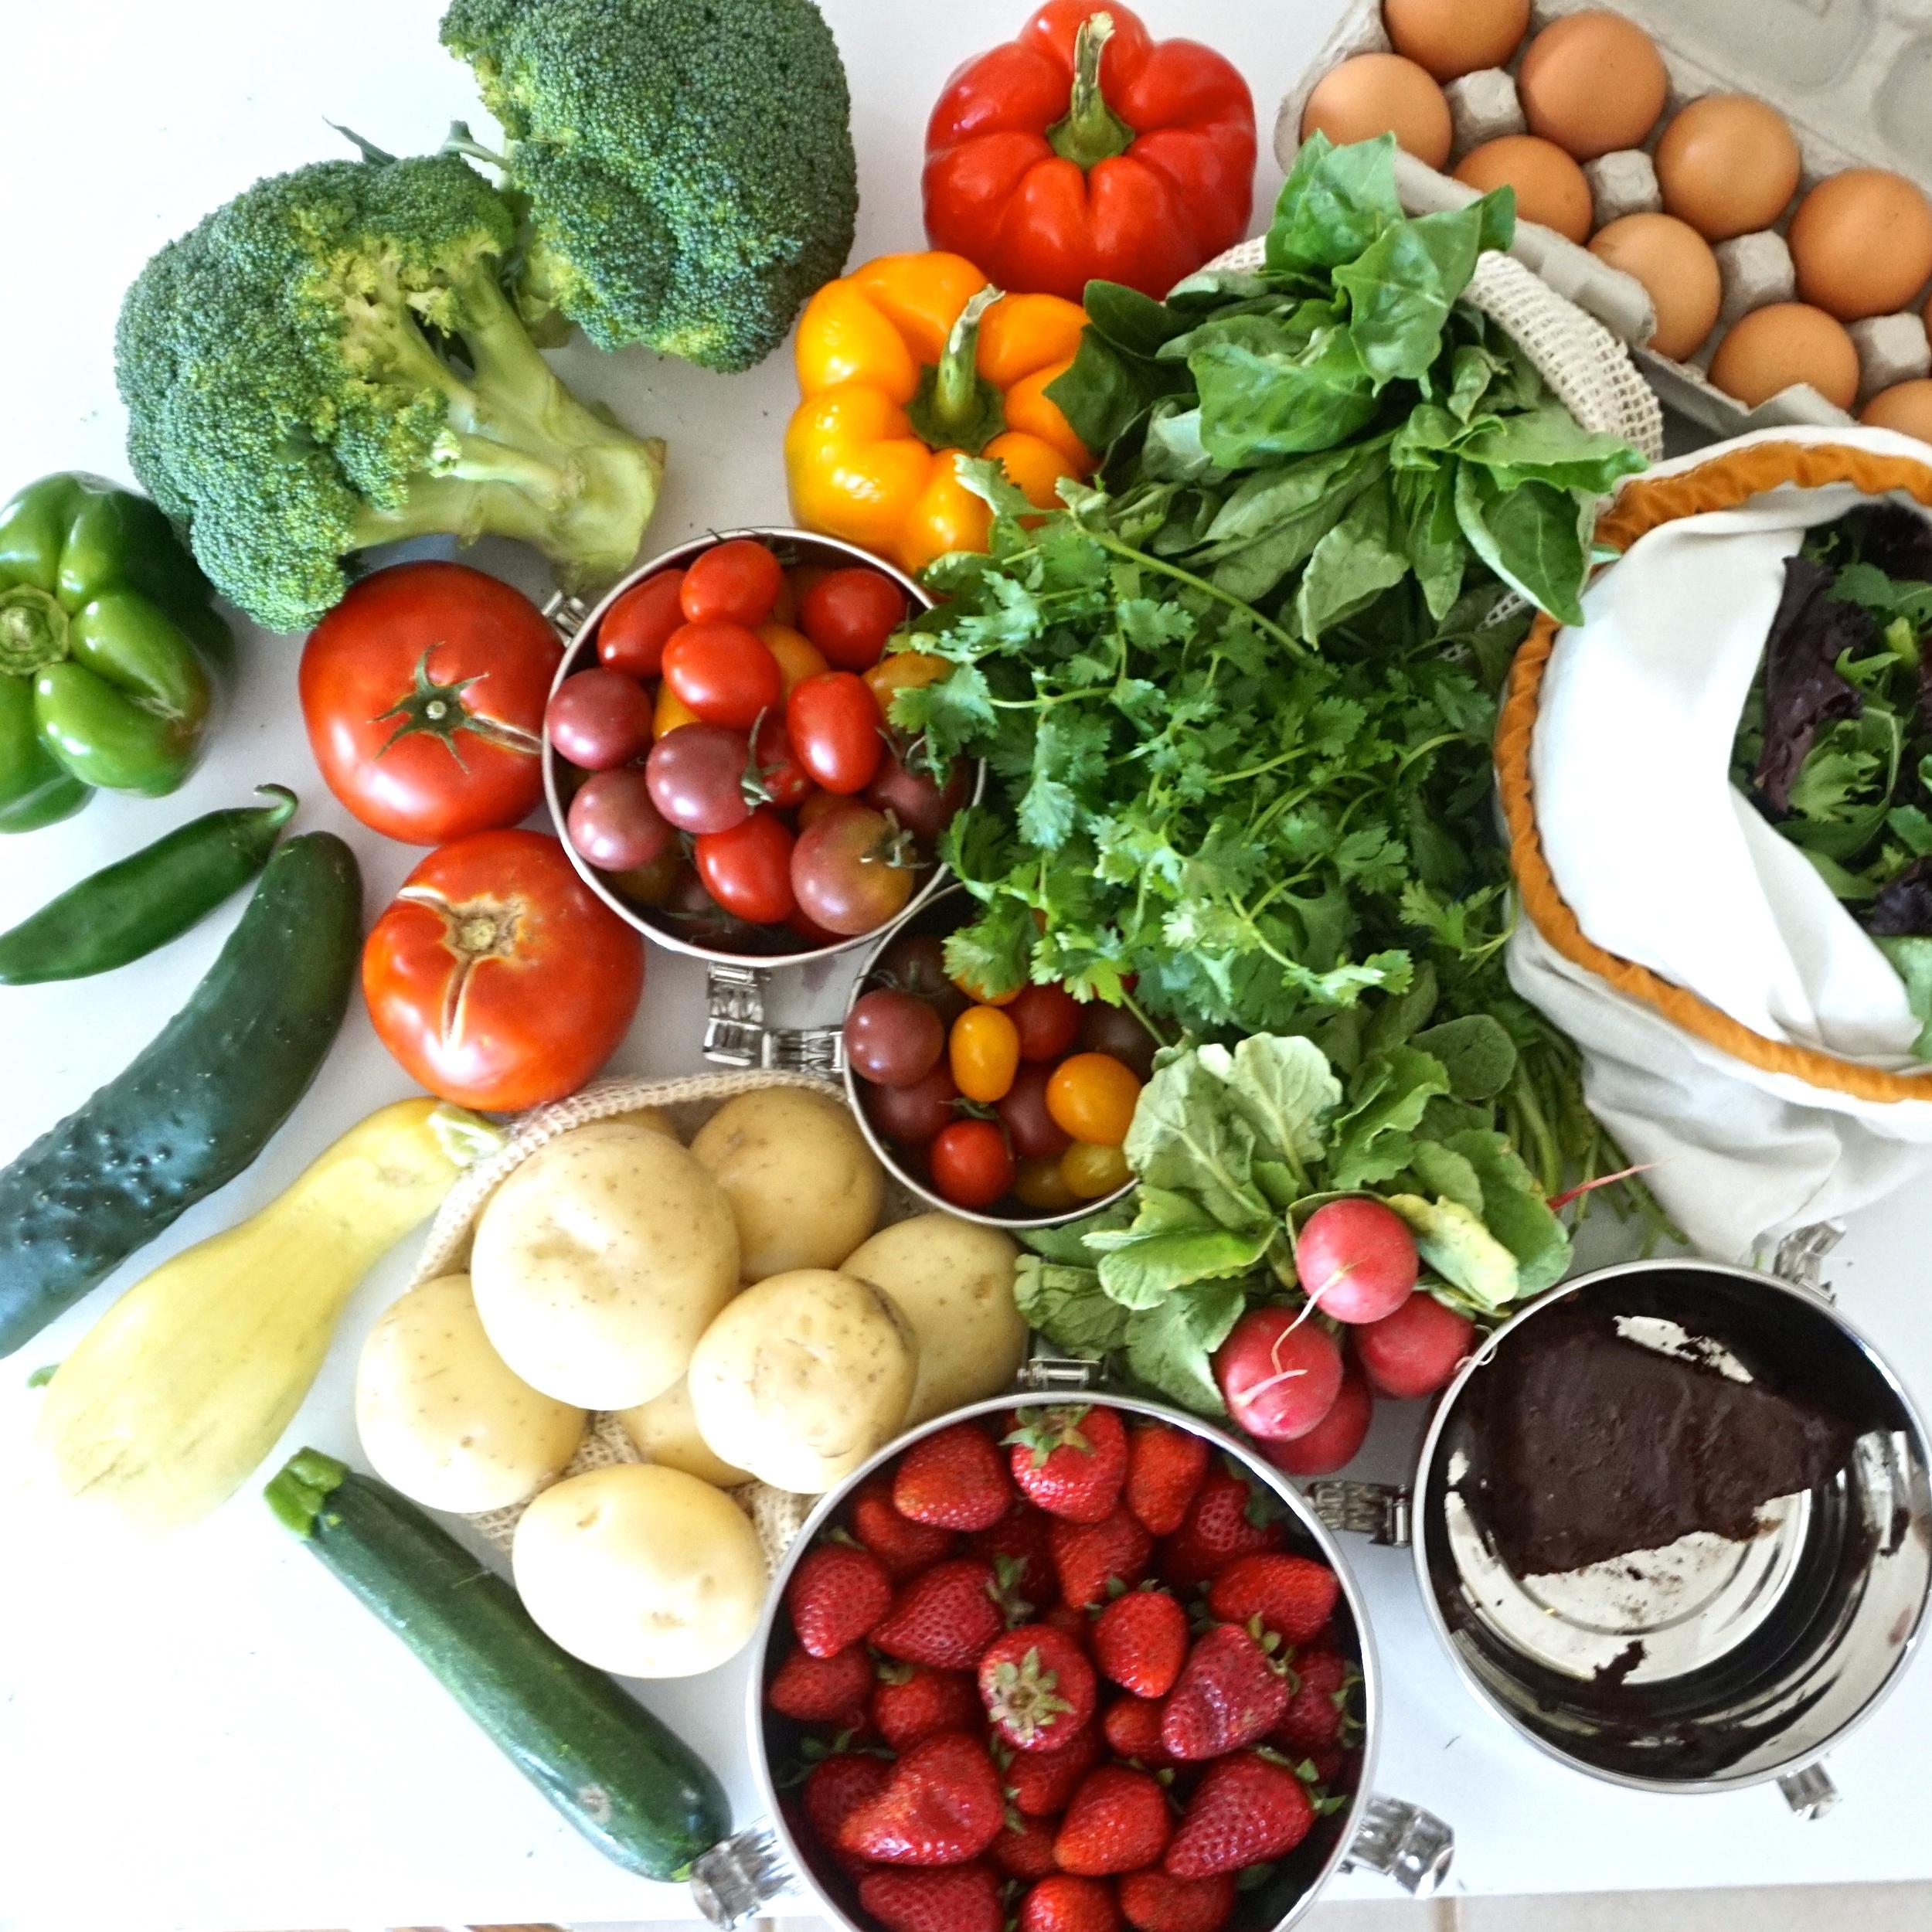 zero waste meal plan and prep with www.goingzerowaste.com